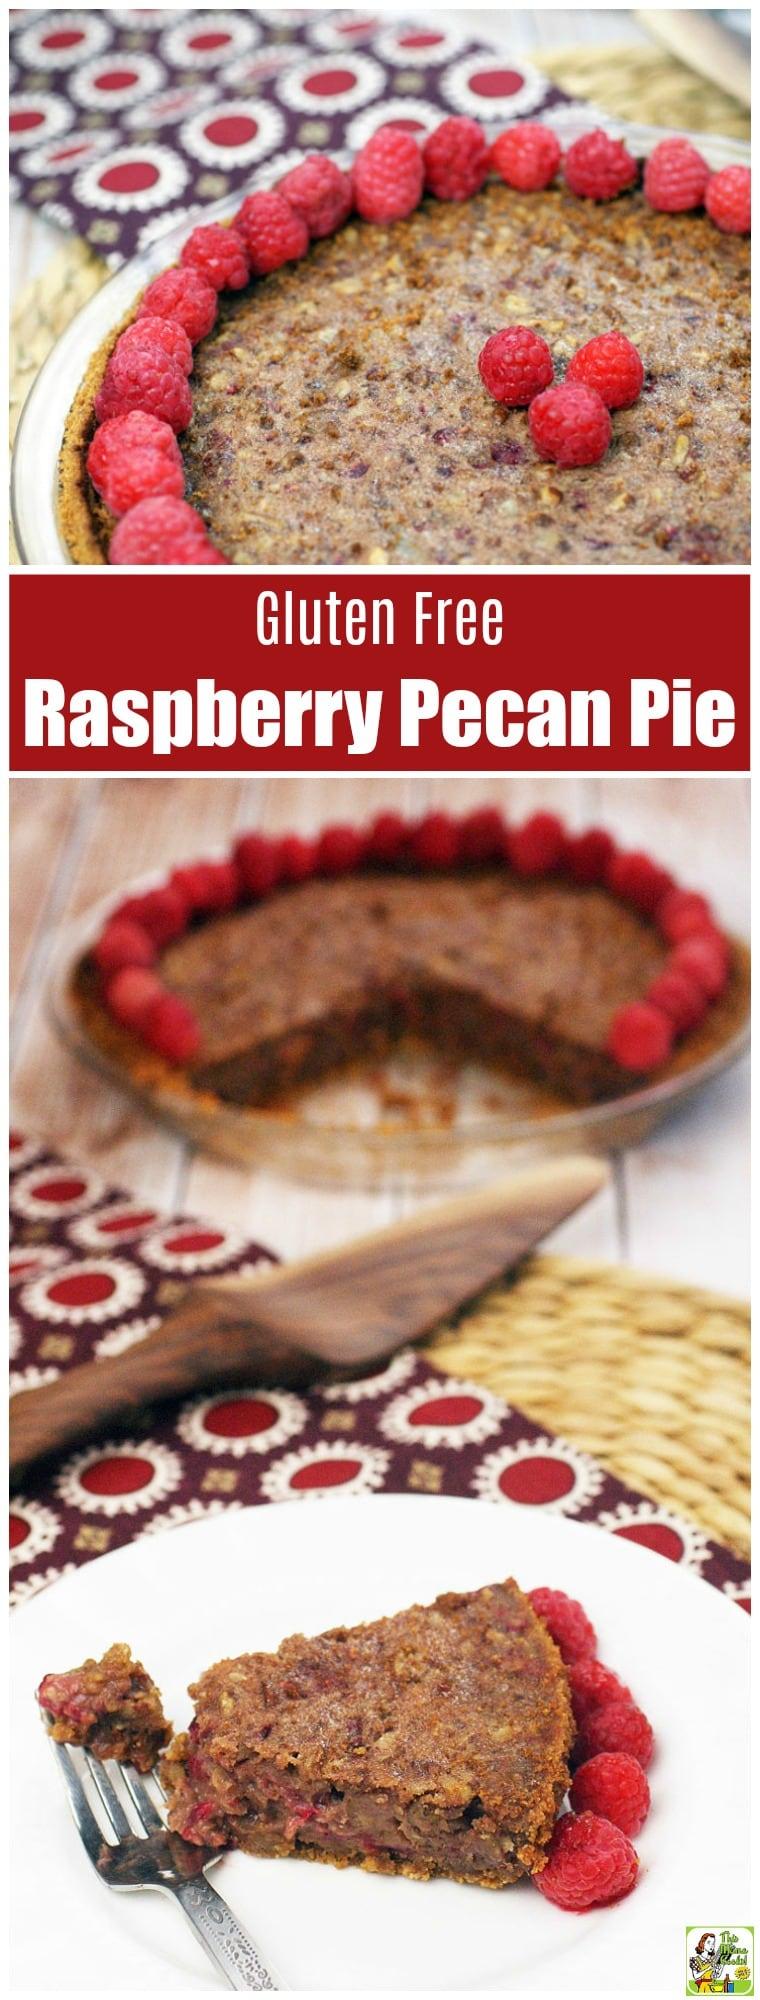 Gluten Free Raspberry Pecan Pie Recipe